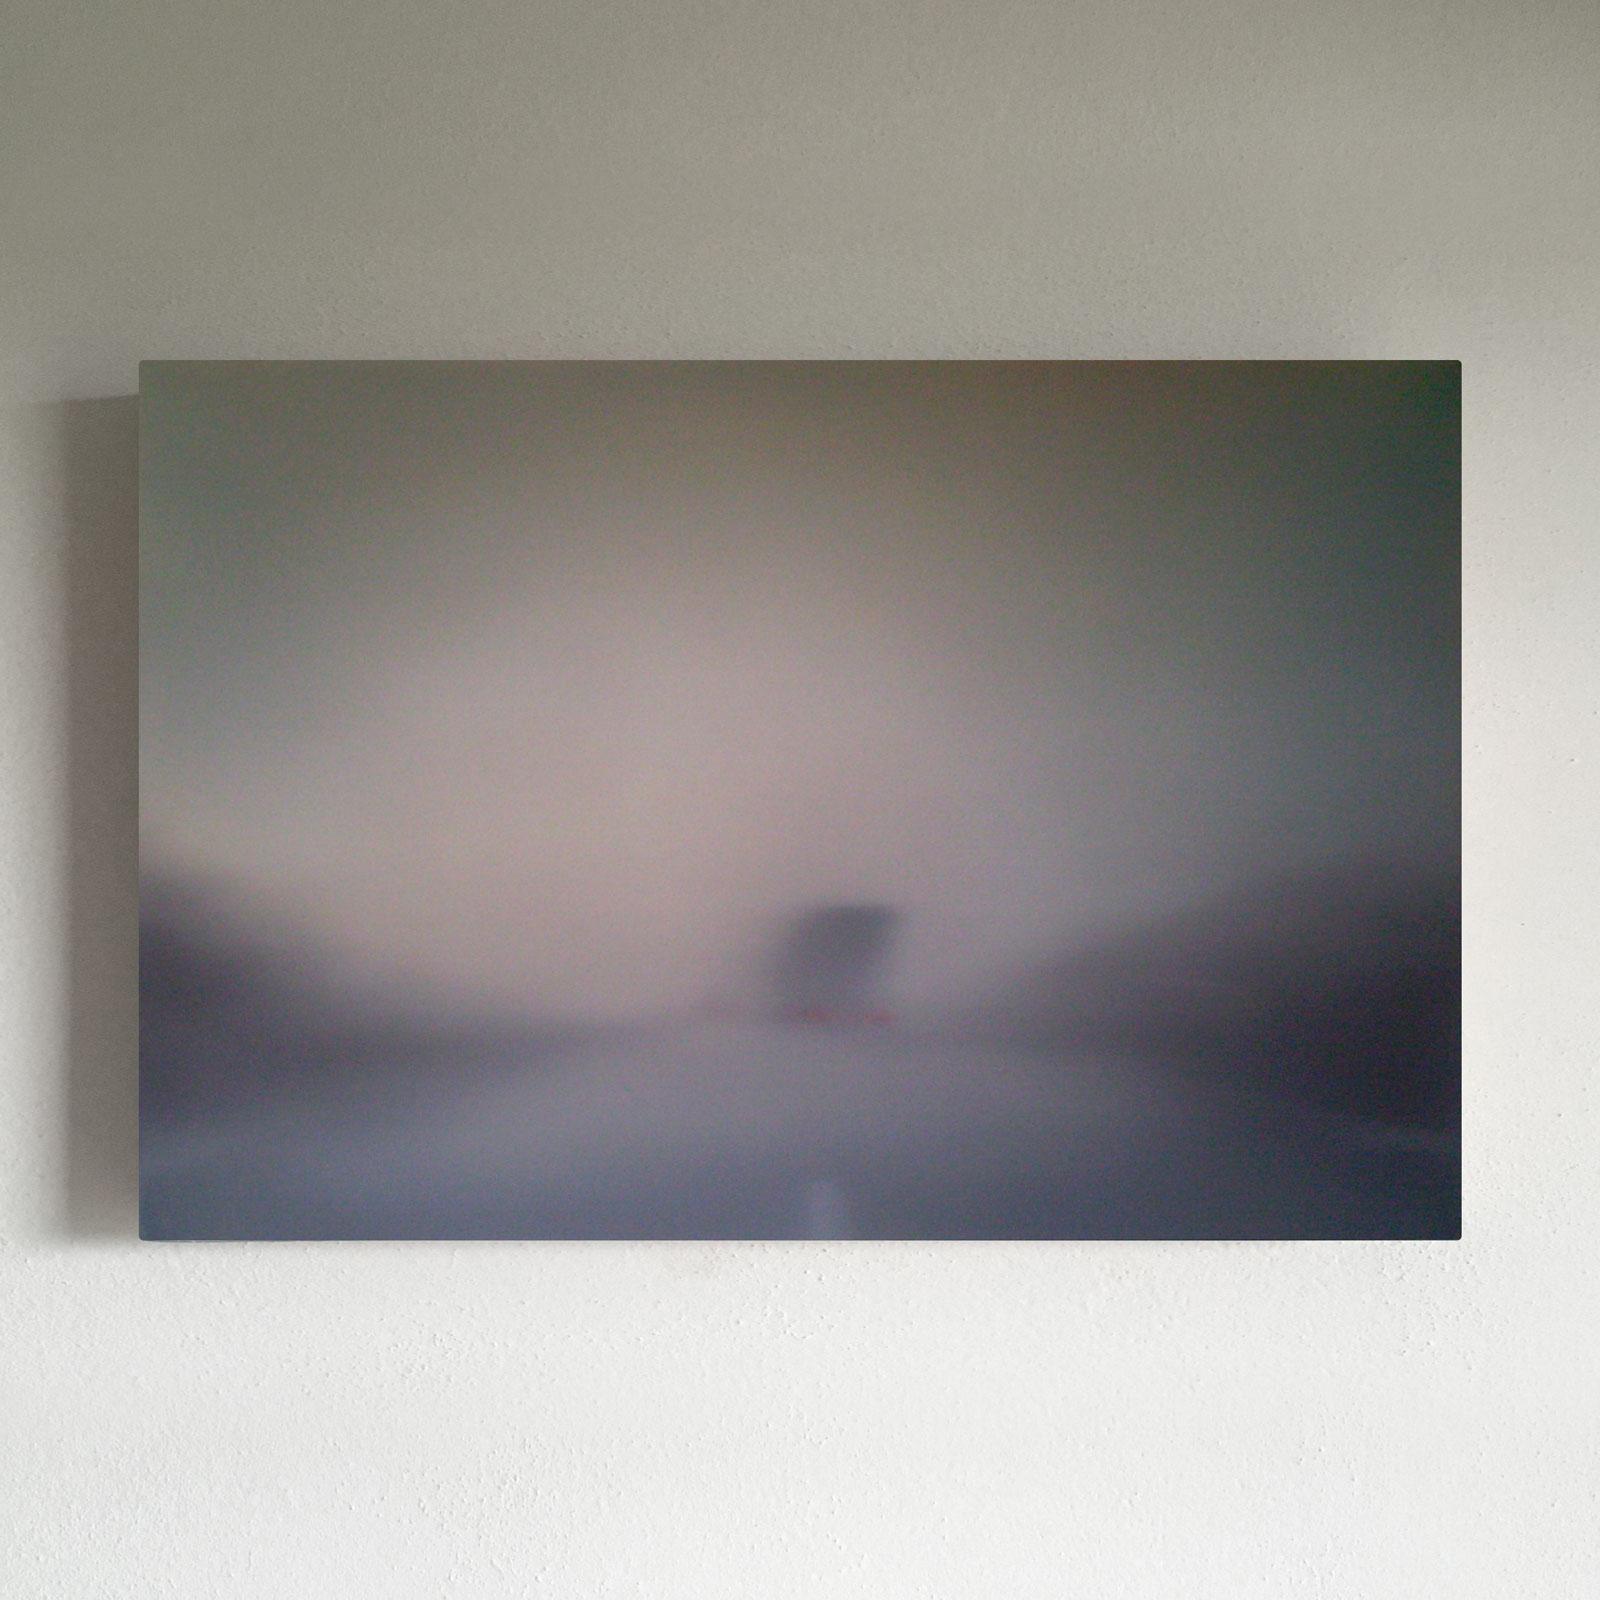 T#29-2009, oil on canvas, 80x120cm, priv. coll.